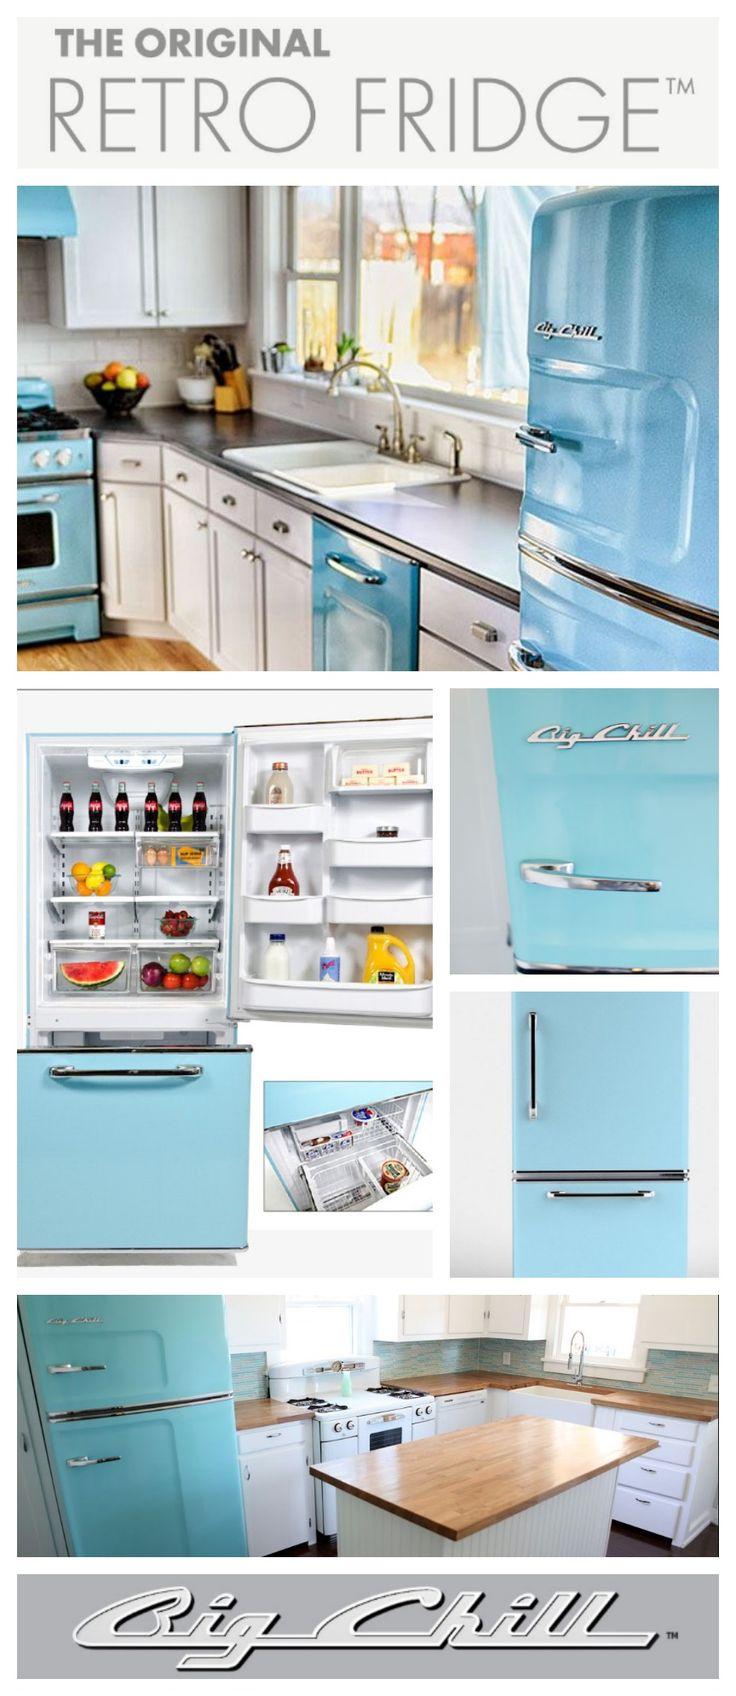 94 best Kitchens for life images on Pinterest | Kitchen ideas, Loft ...